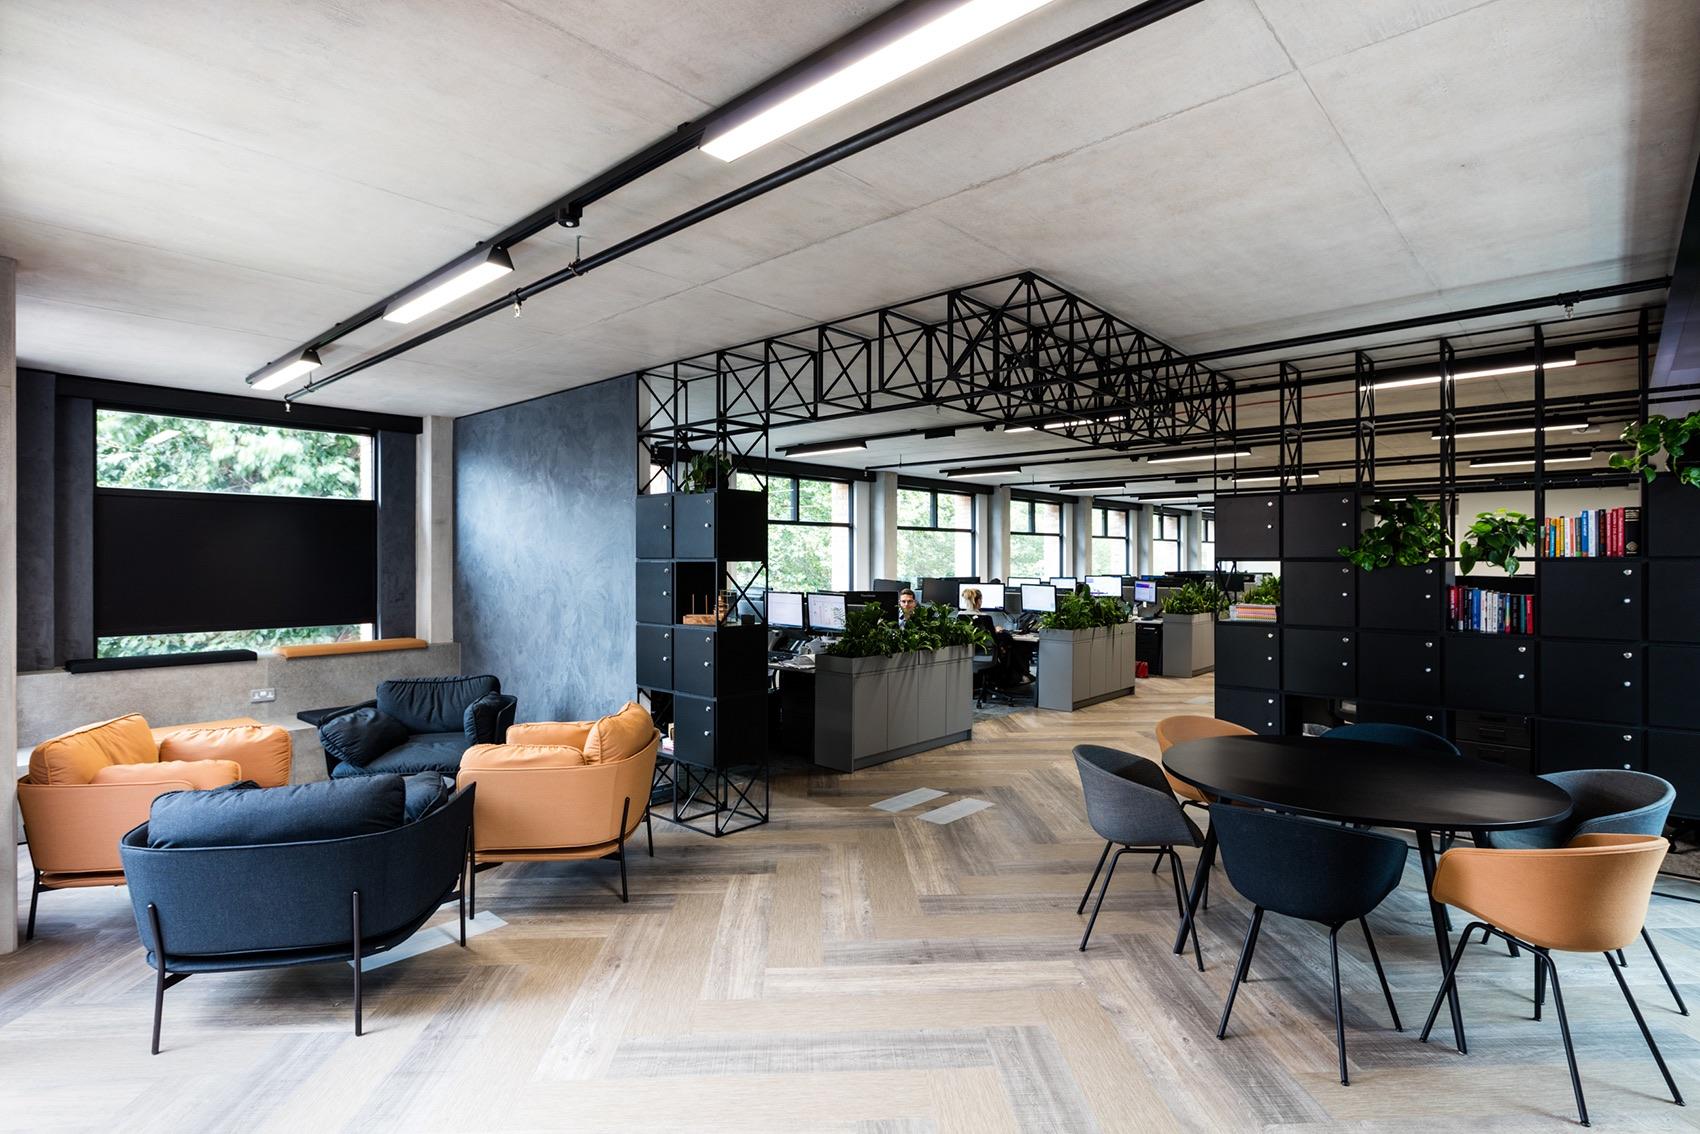 albion-capital-london-office-10